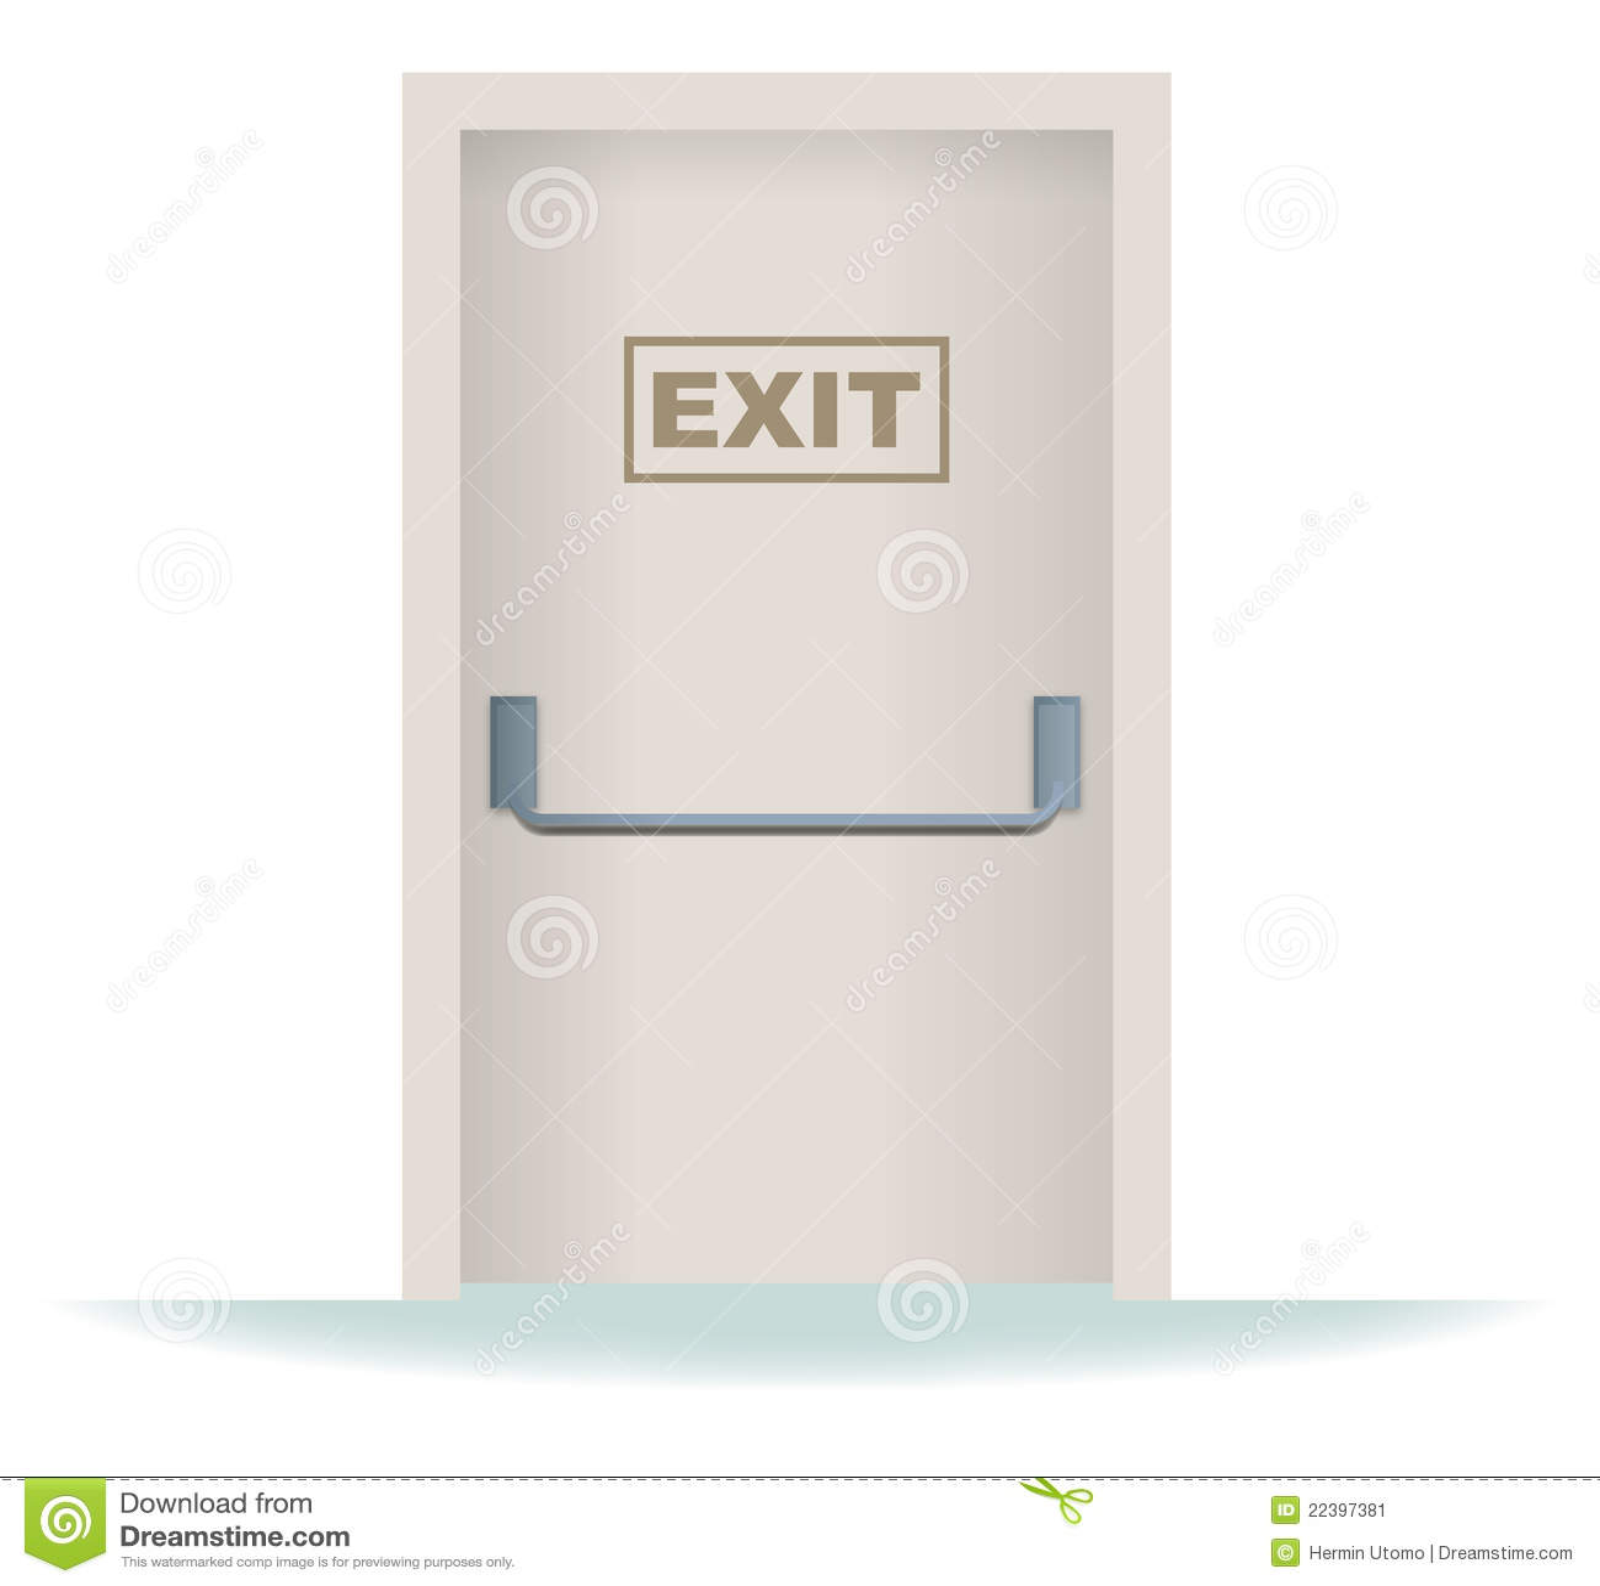 Royalty-Free Stock Photo. Download Exit Door ...  sc 1 st  Dreamstime.com & Exit Door Stock Image - Image: 22397381 pezcame.com